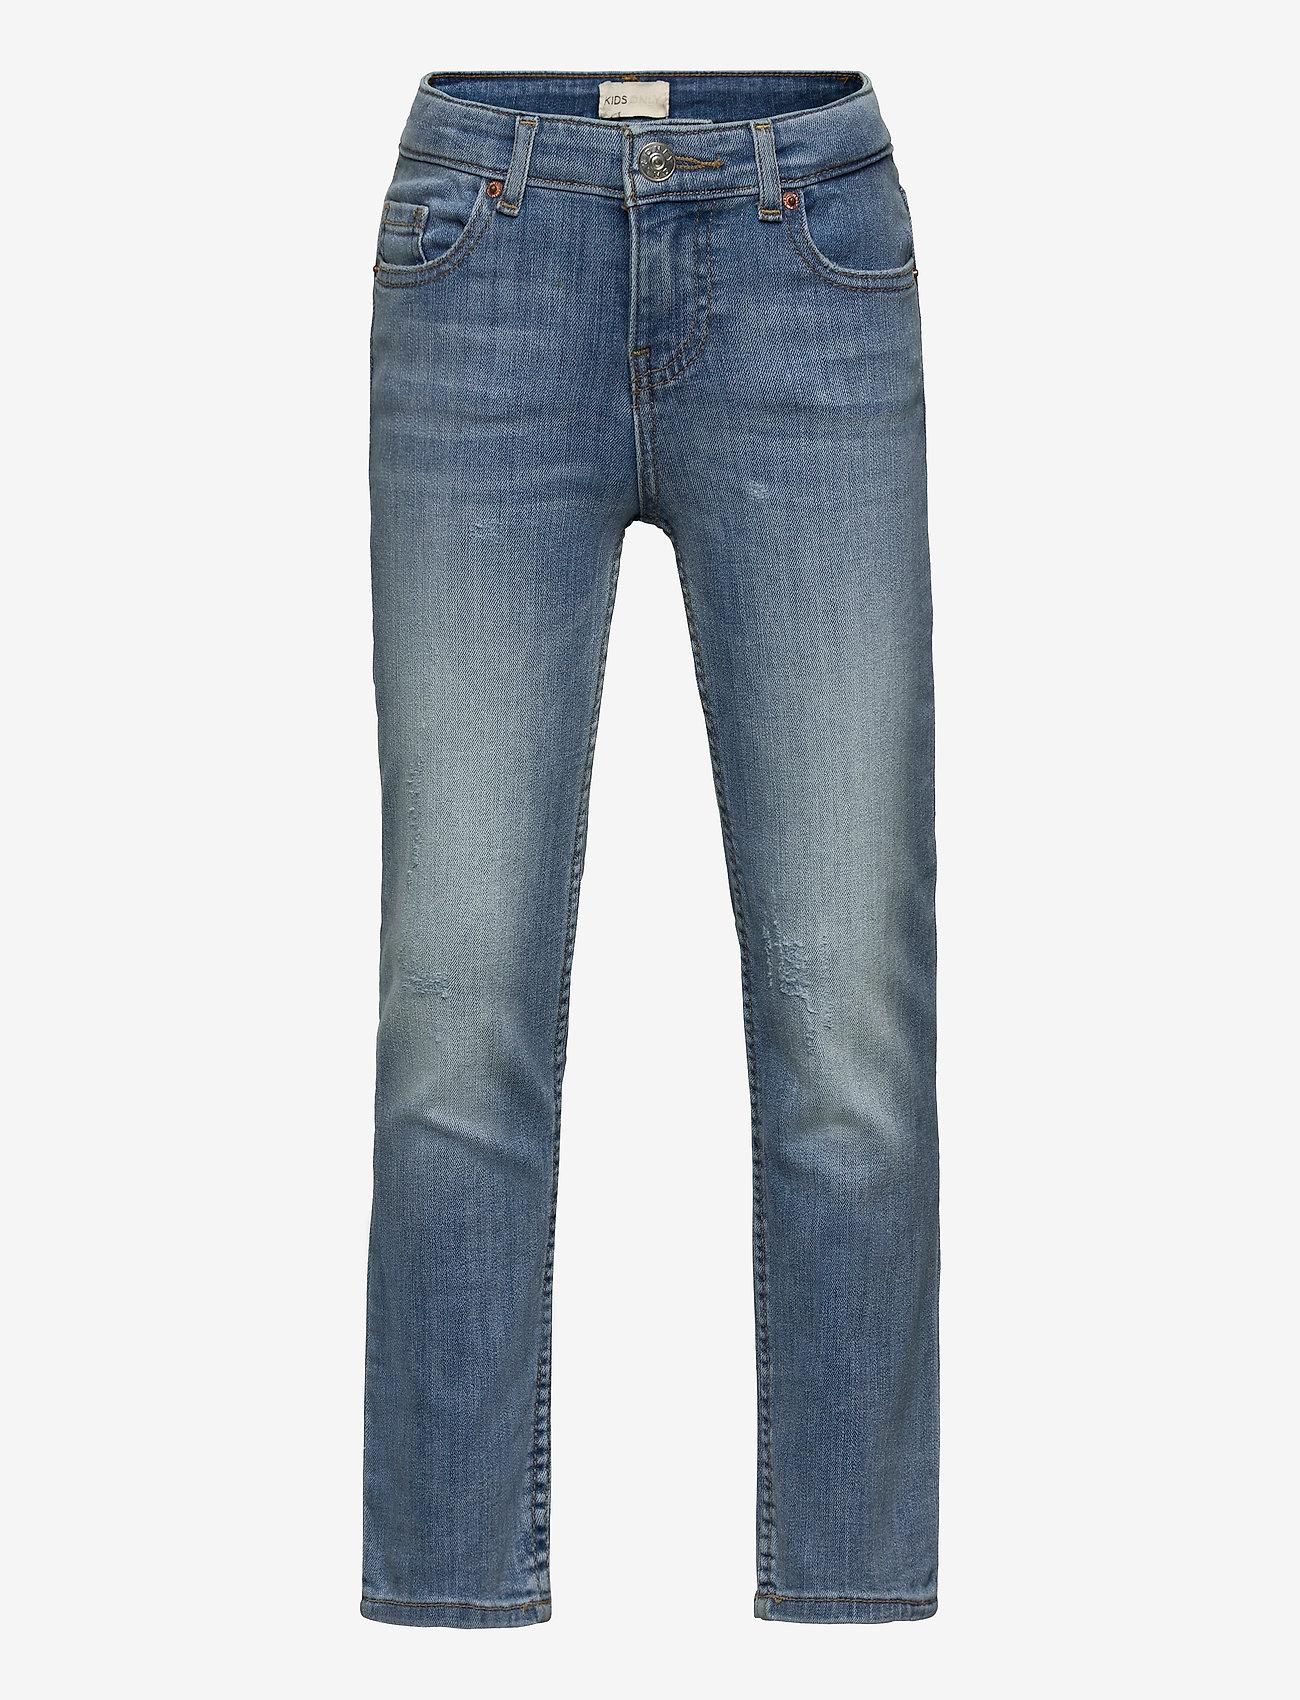 Kids Only - KONSOPHIE ANKLE STRAIGHT JEANS - jeans - light blue denim - 0